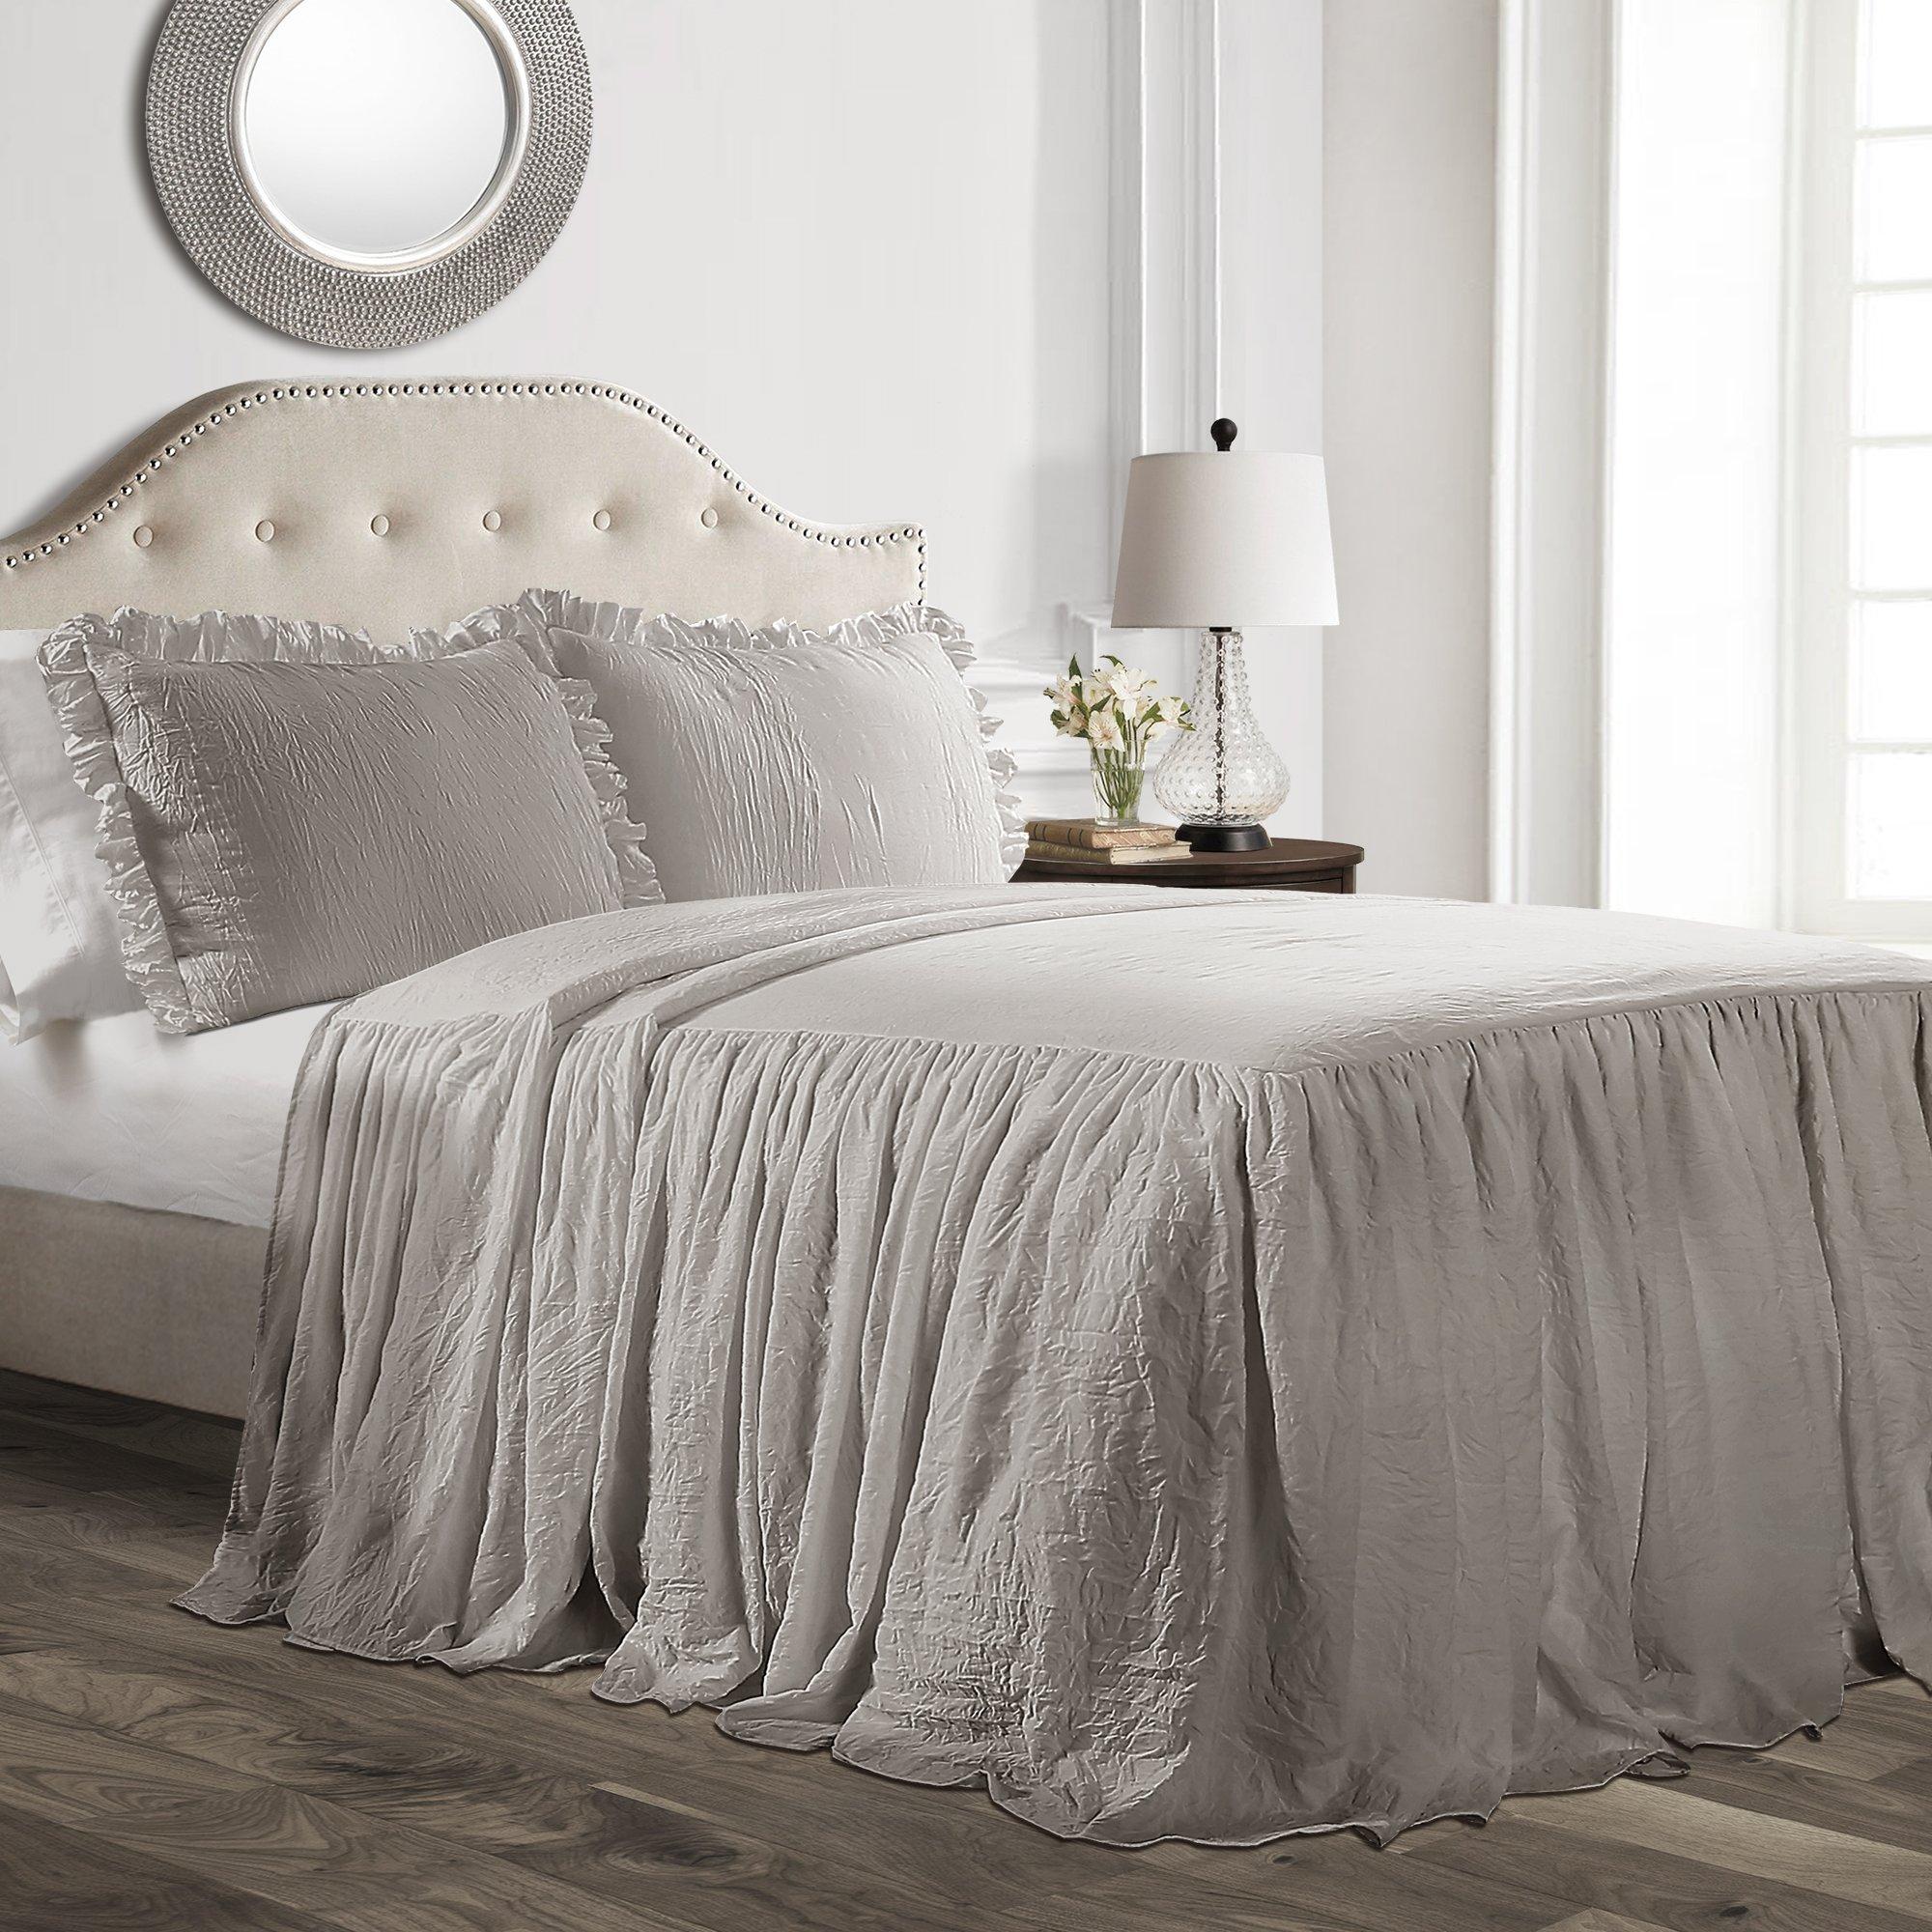 Lush Decor Ruffle Skirt 2 Piece Bedspread Set 2, Twin, Gray